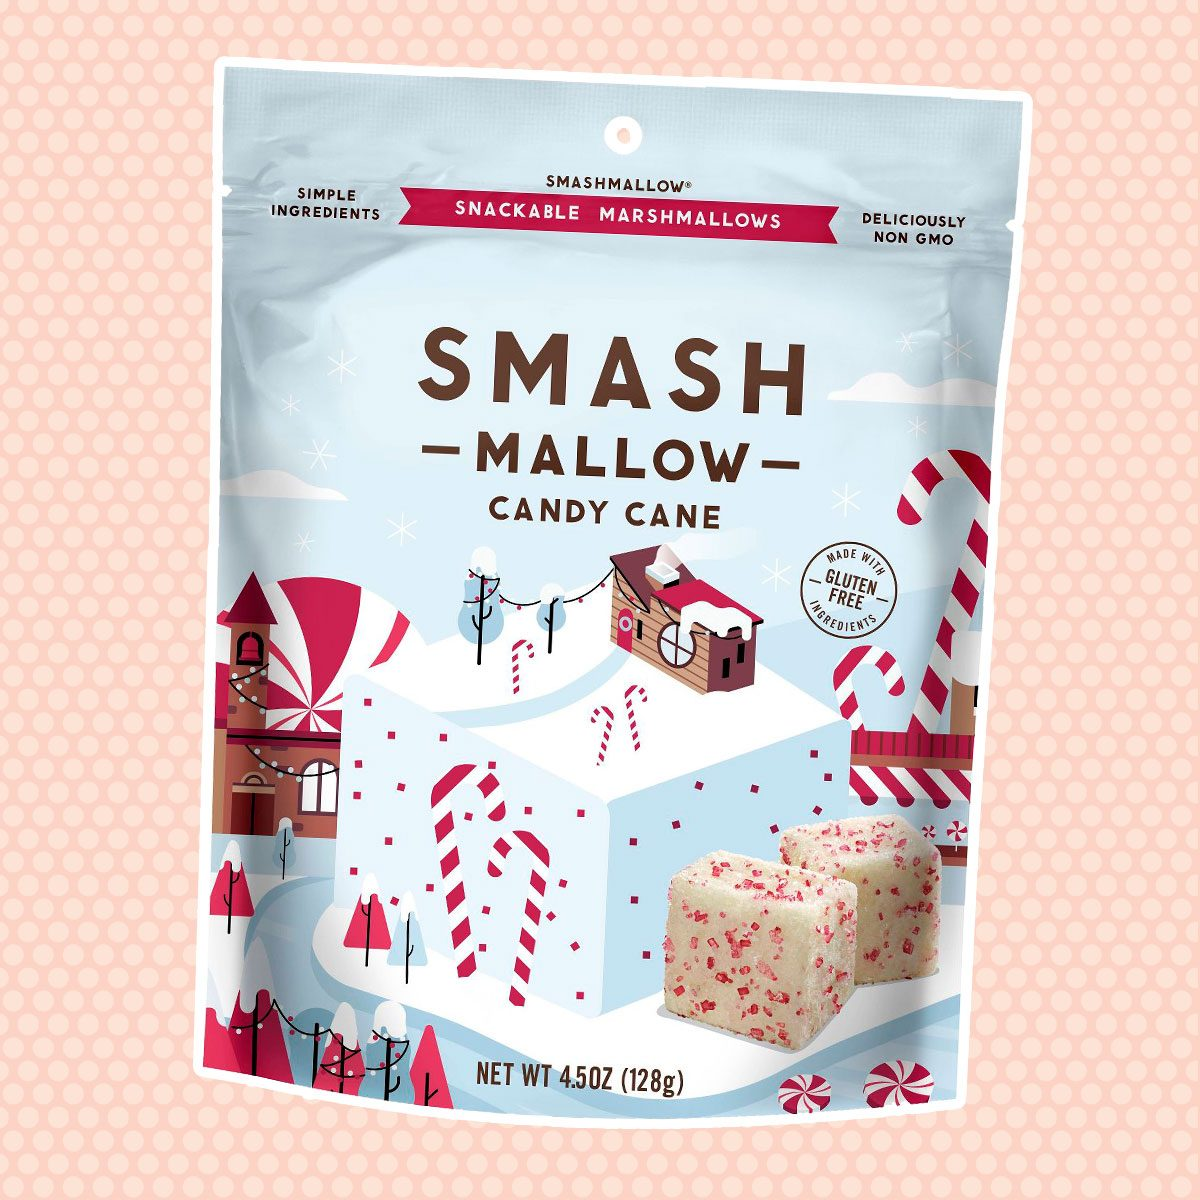 SMASHMALLOW Snackable Marshmallows